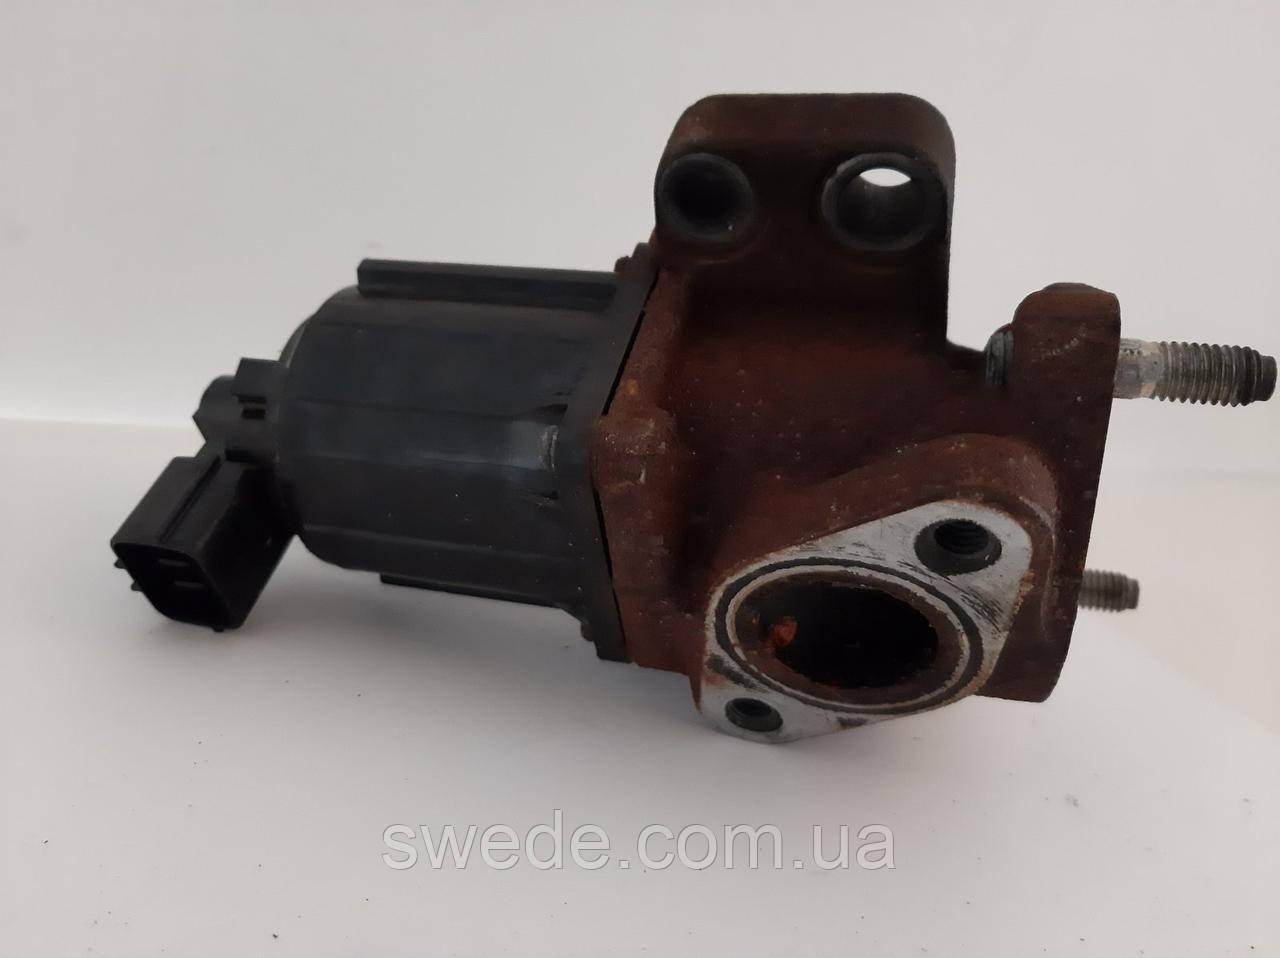 Клапан EGR Mazda 6 2.0 CITD 2008 гг K5T70871